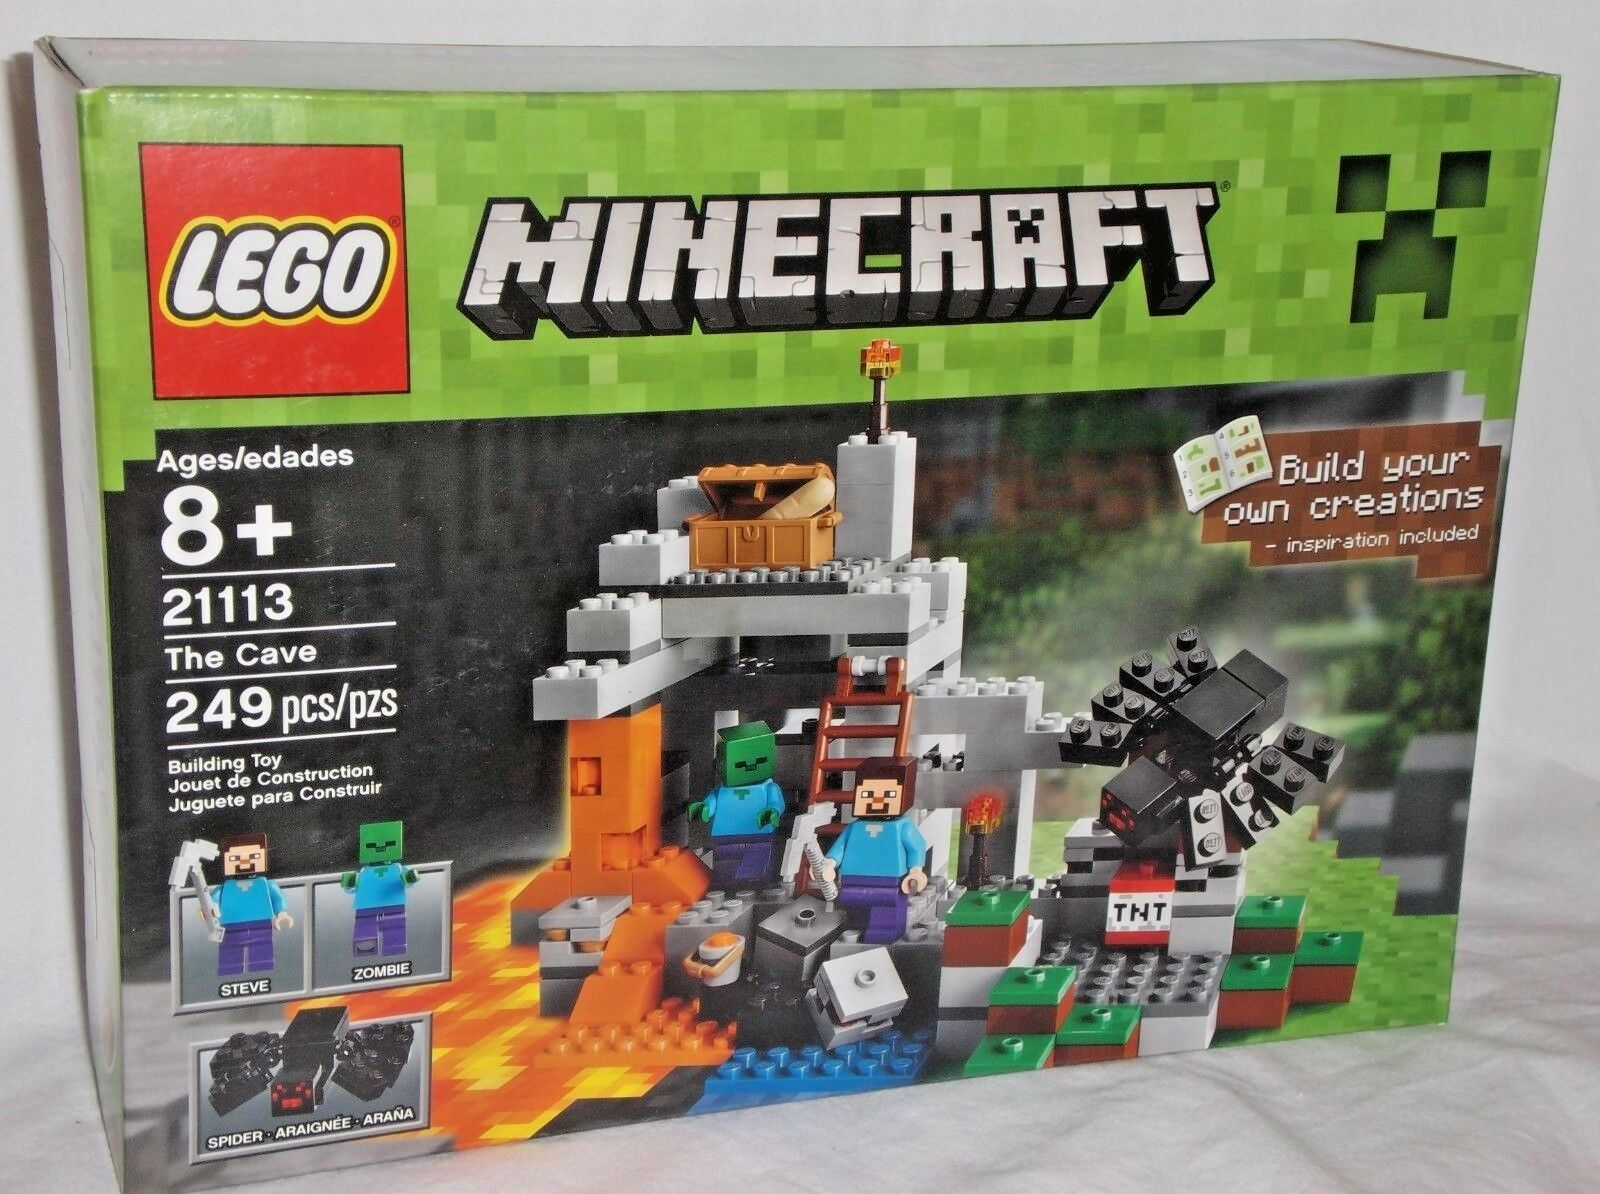 SEALED 21113 LEGO Minecraft CAVE Steve Zombie Spider Lava TNT 249 pc set 6092417